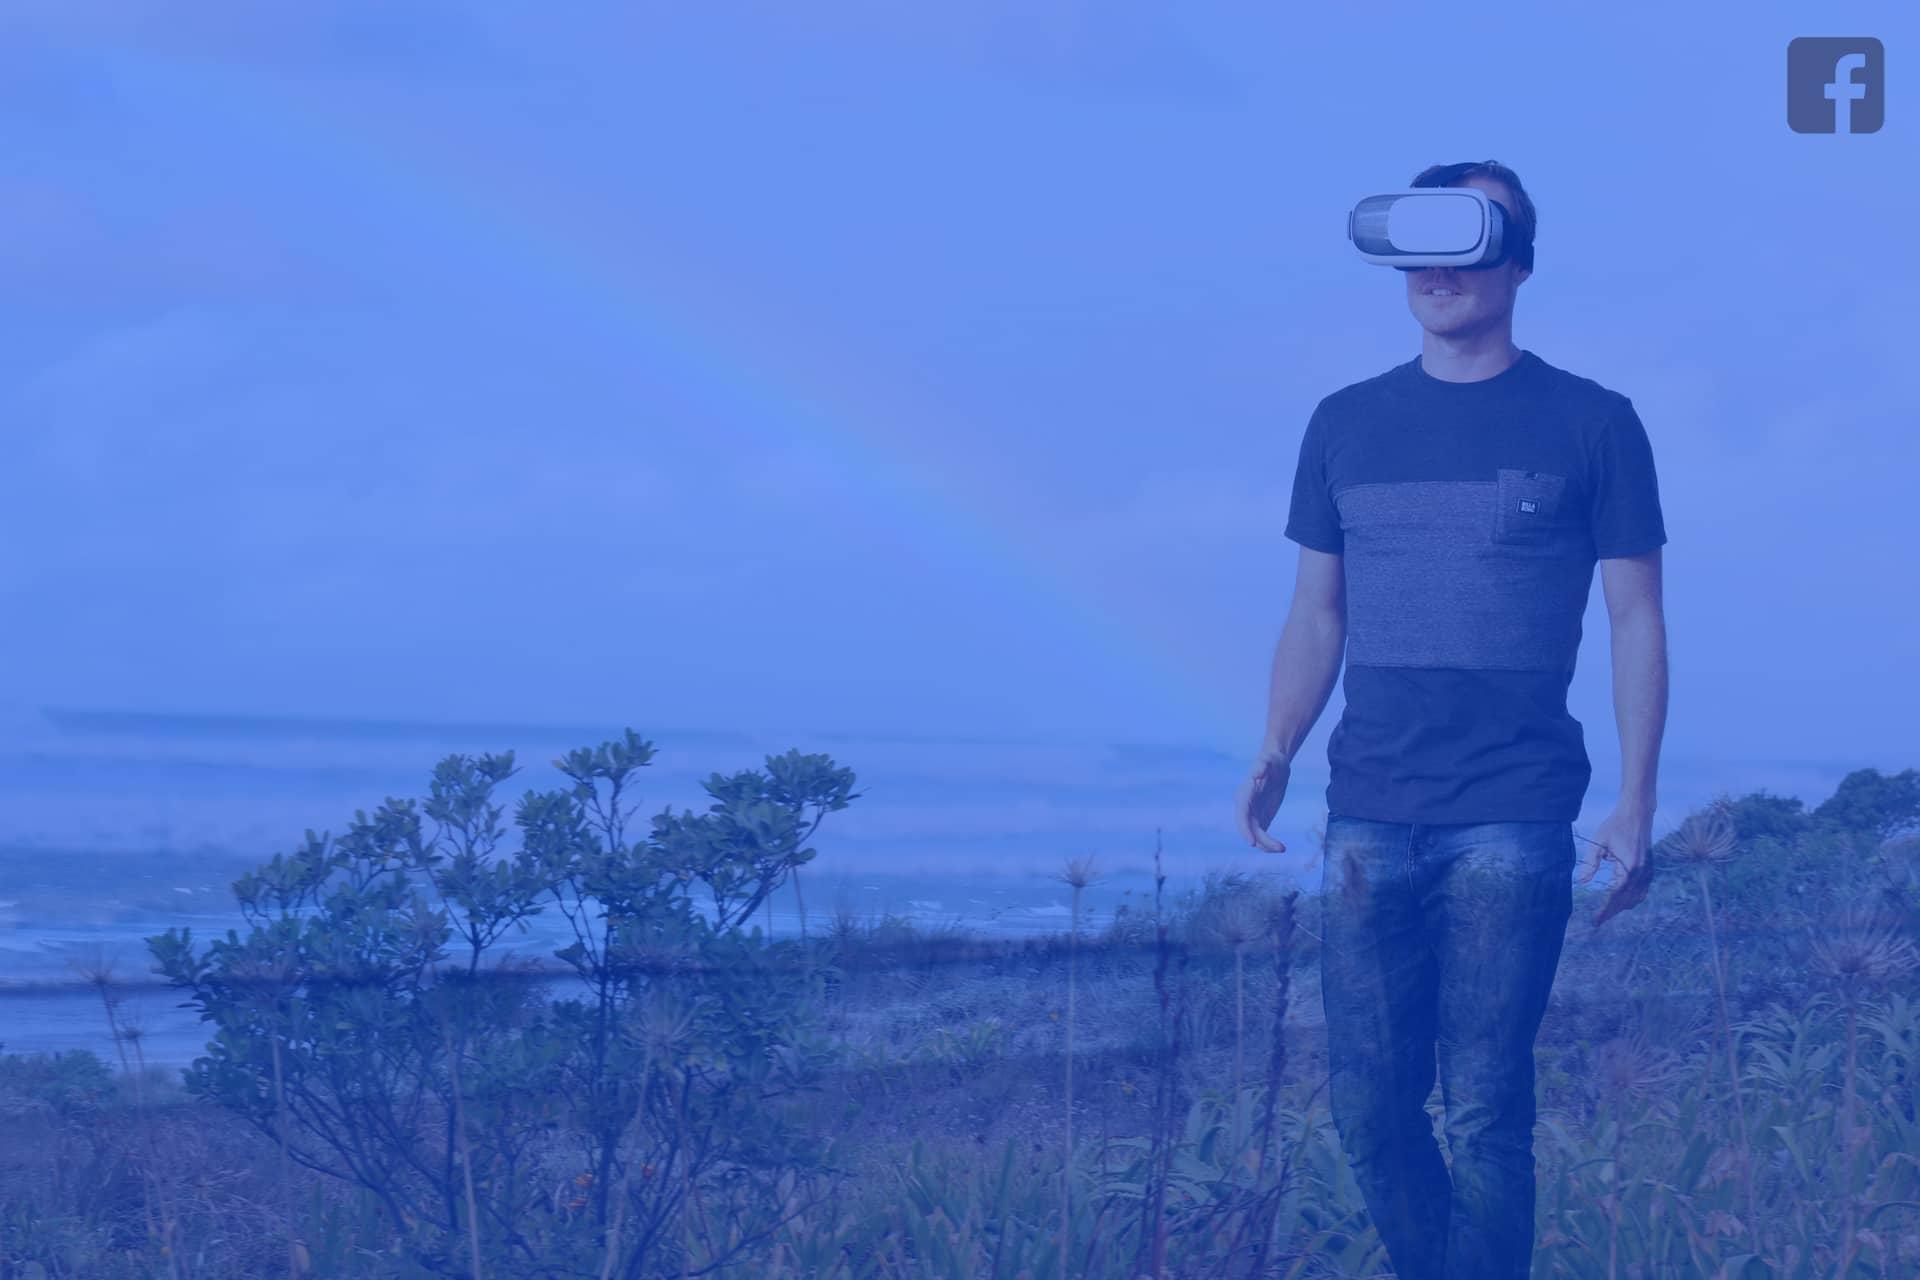 Realtà virtuale e Facebook